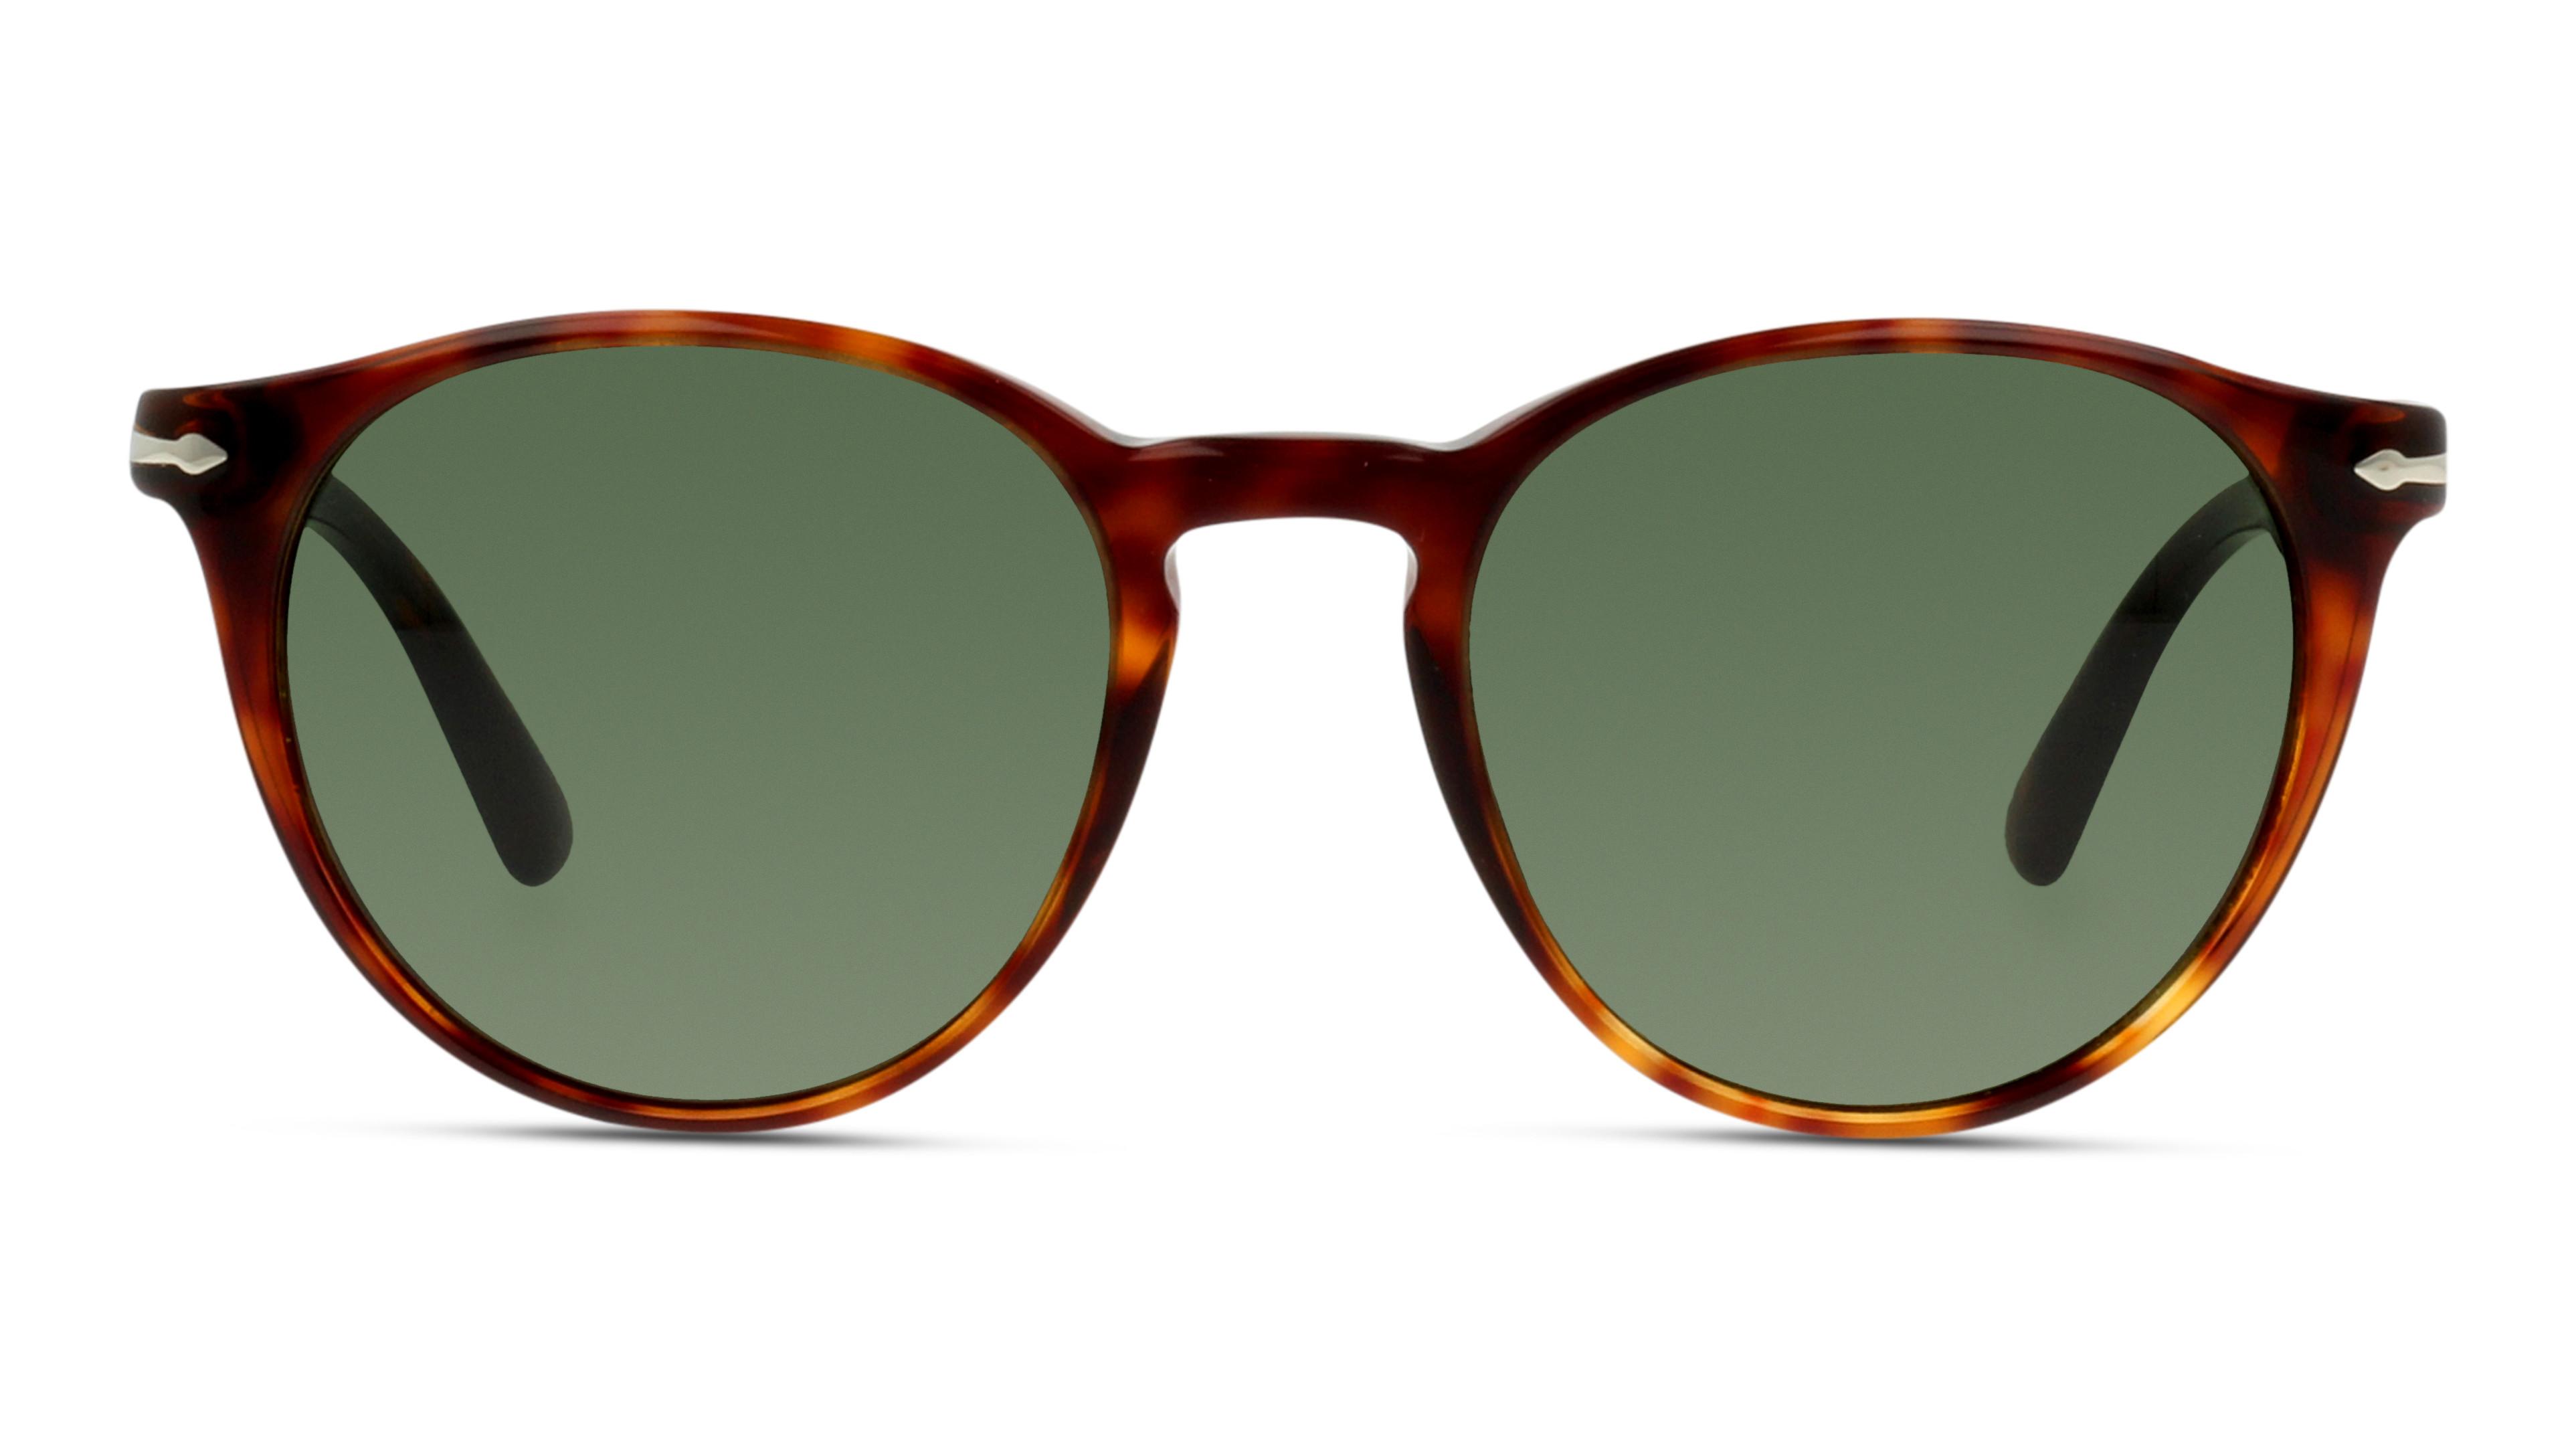 8053672618600-front-01-persol-glasses-eyewear-pair